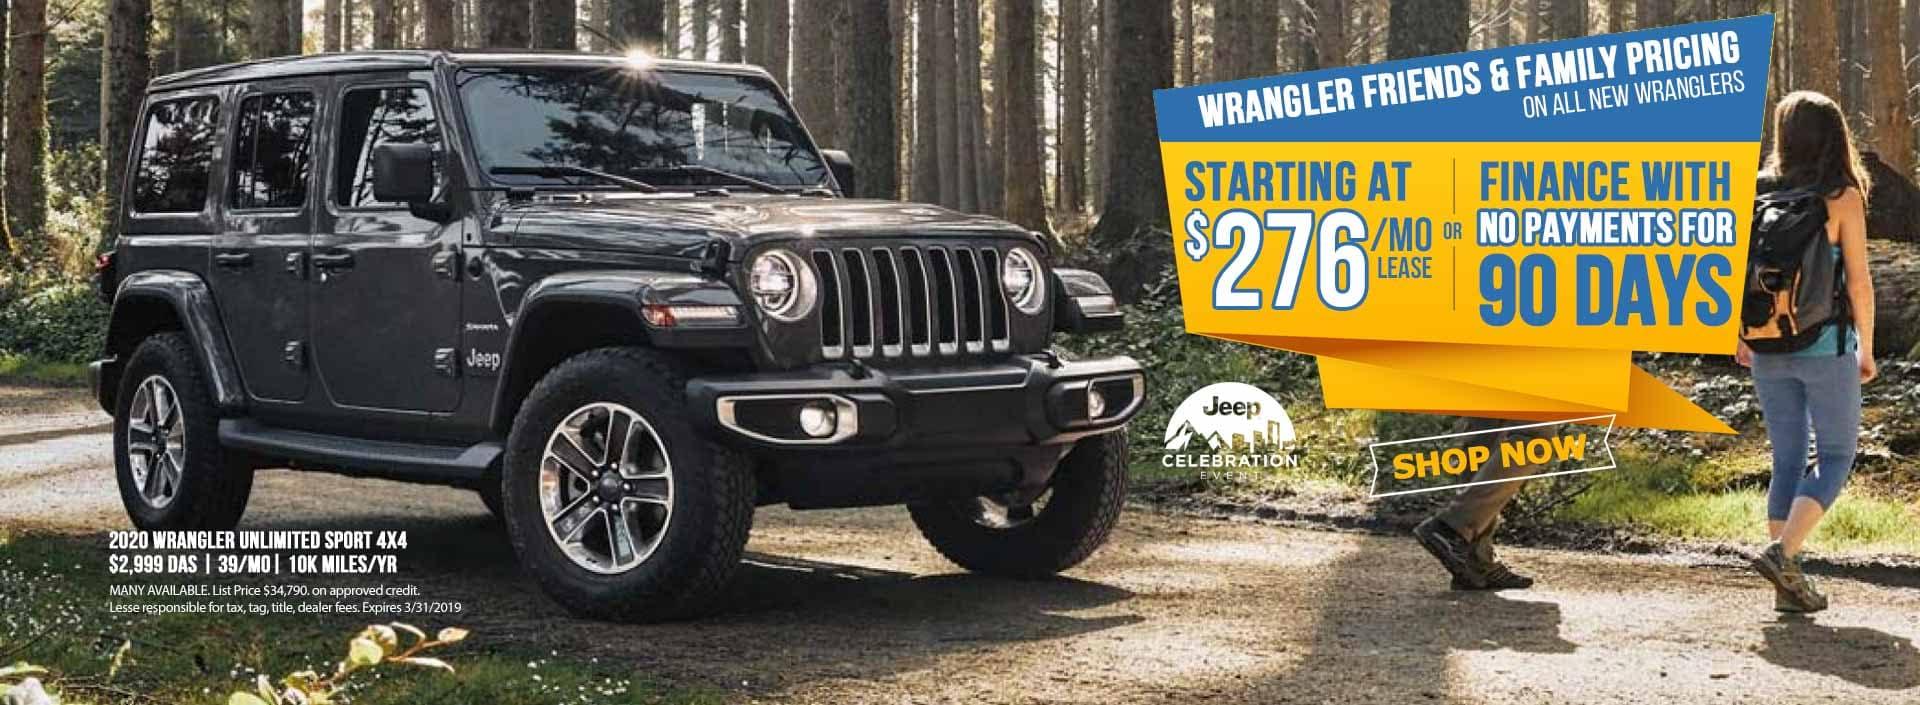 Jeep Wrangler 2020 Sale